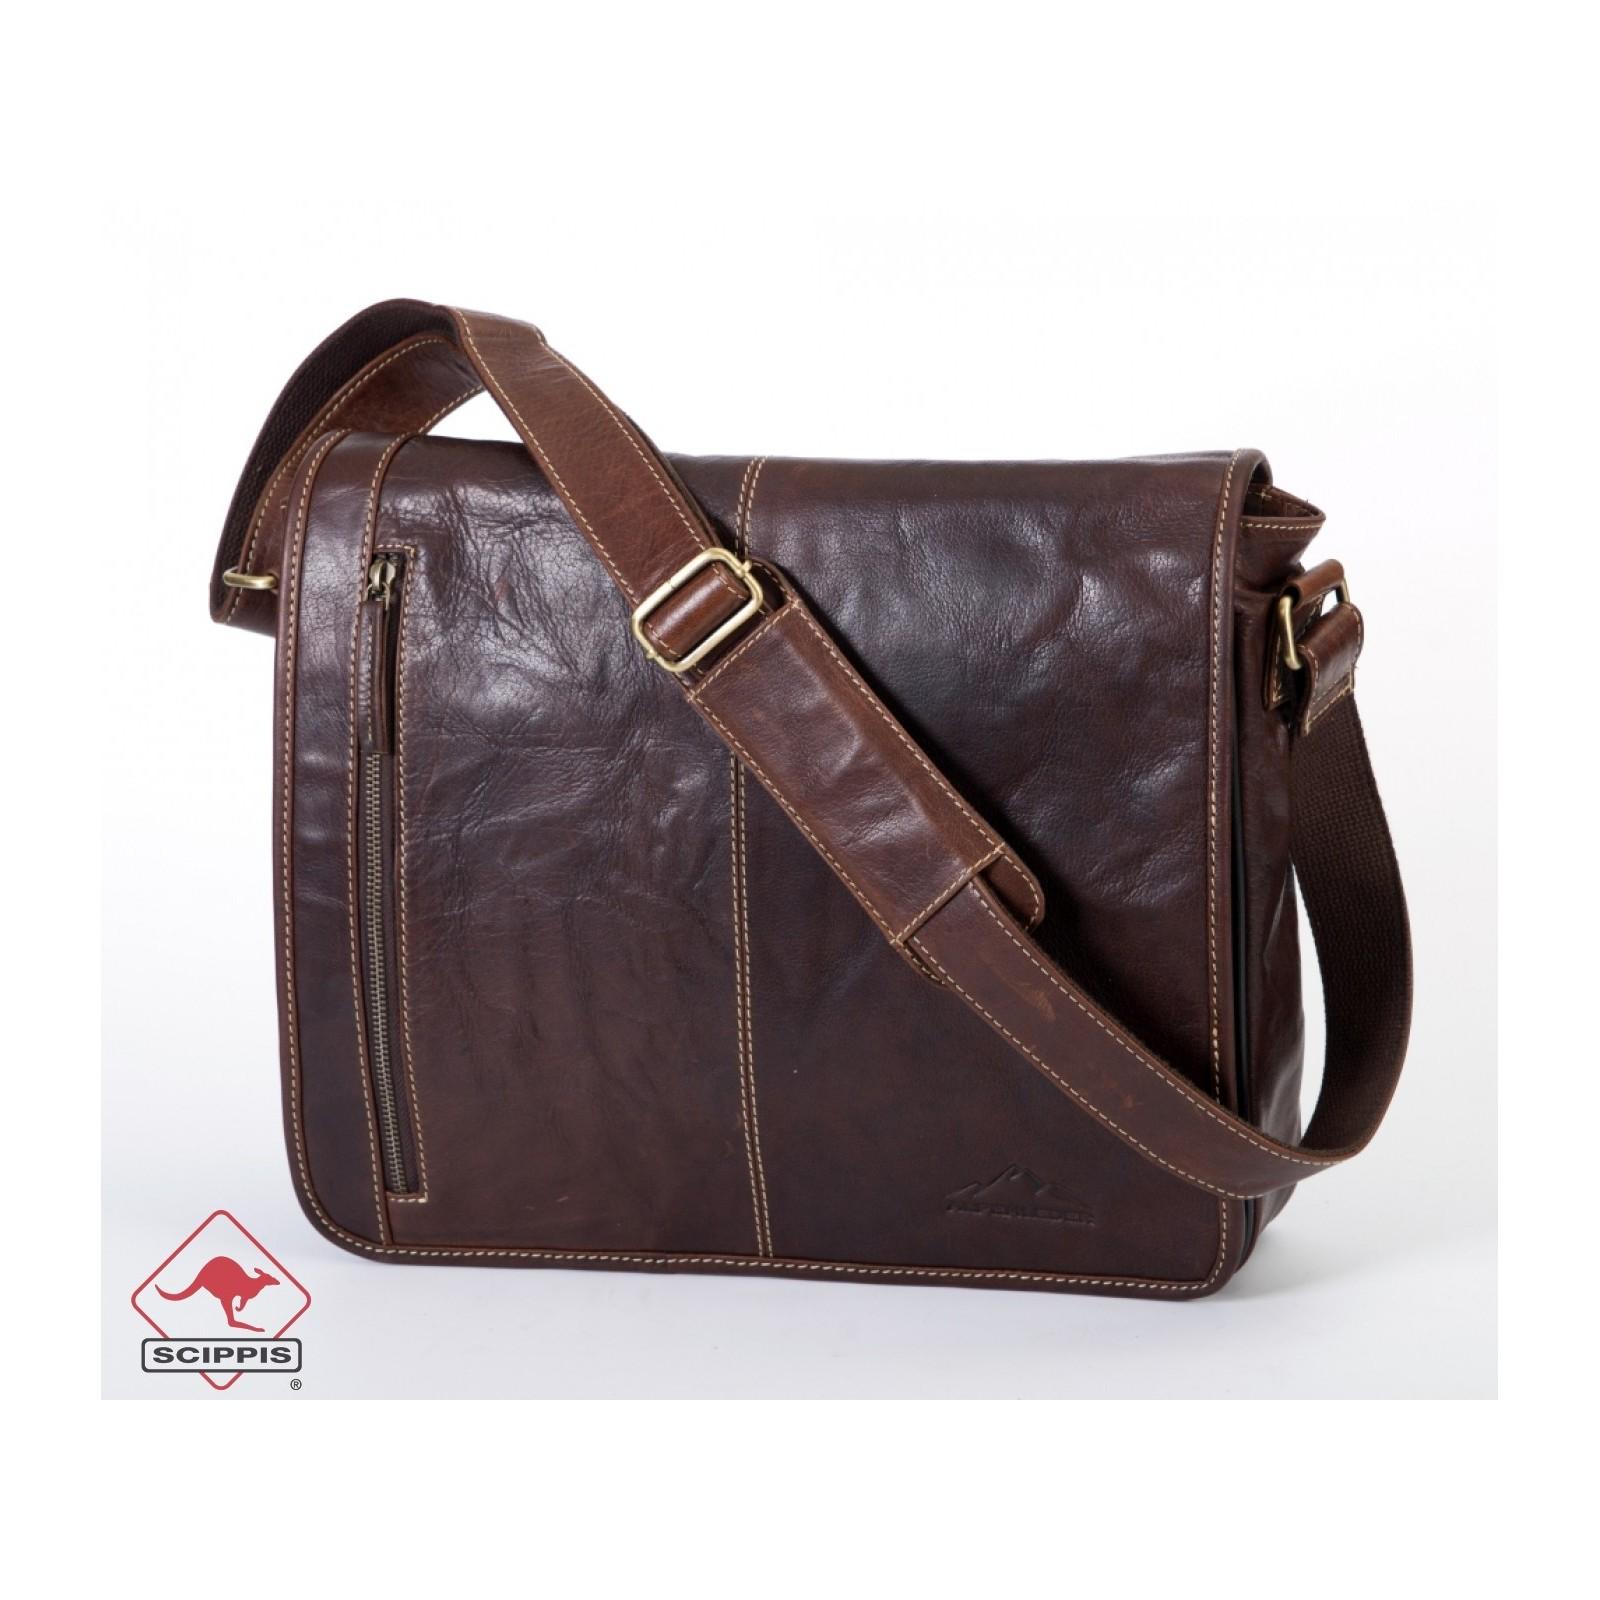 Scippis Atlanta Messenger Bag